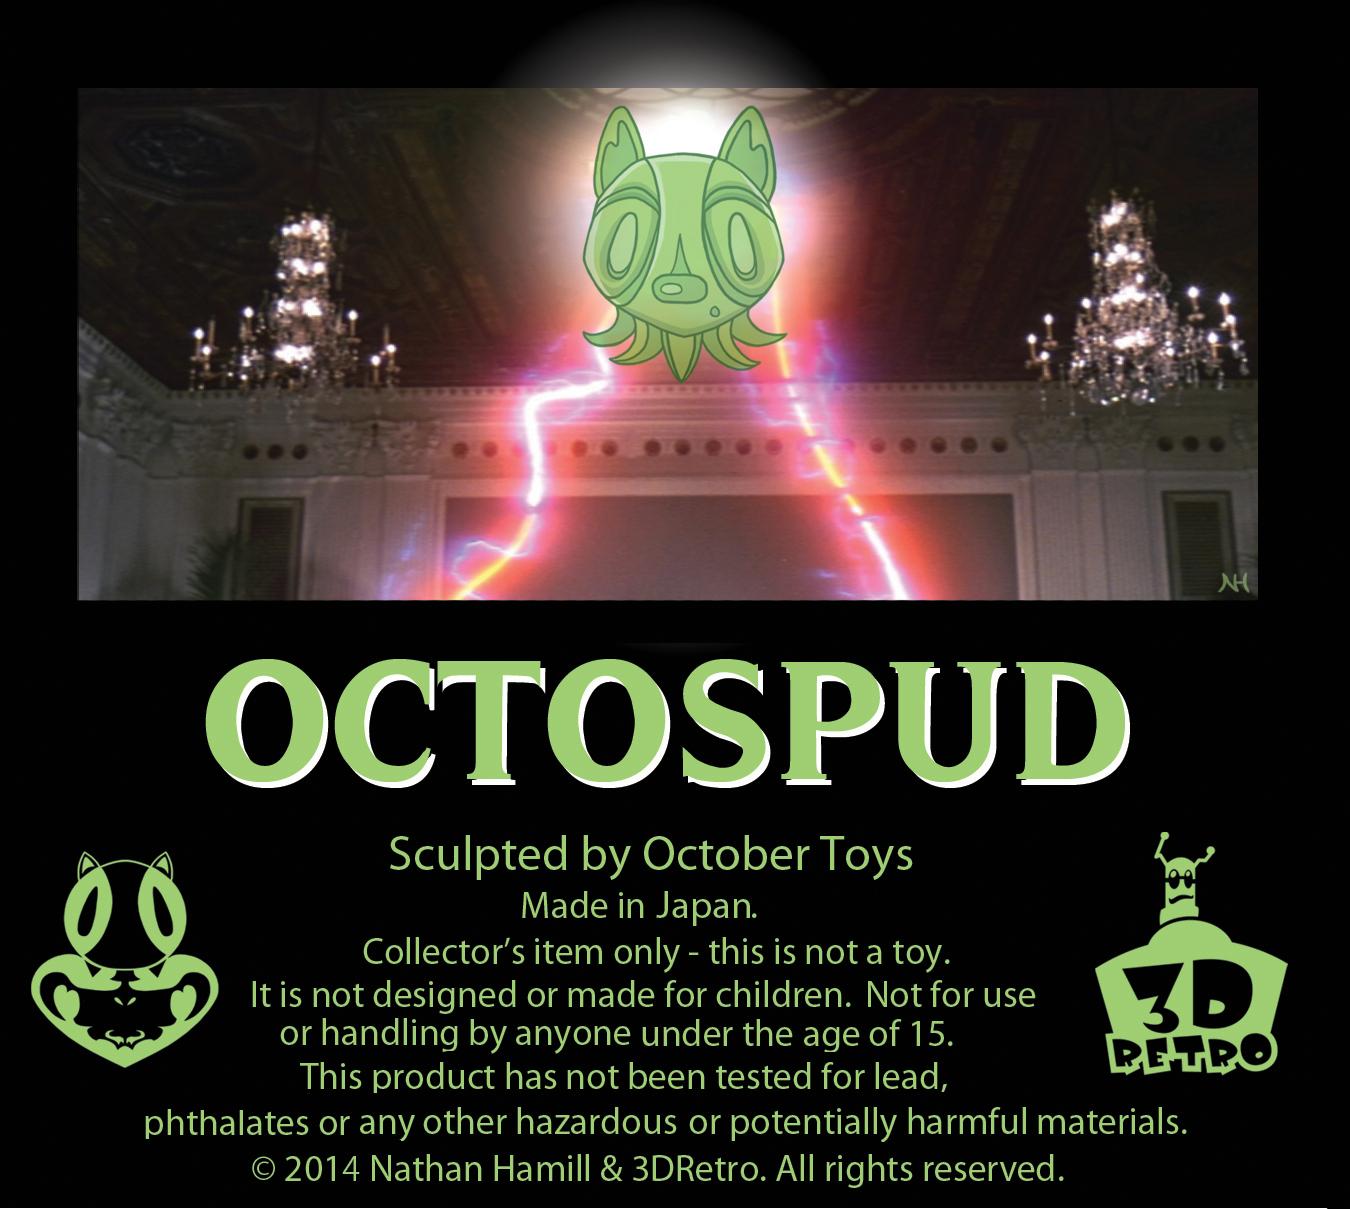 Octopup: Octospud Ed.